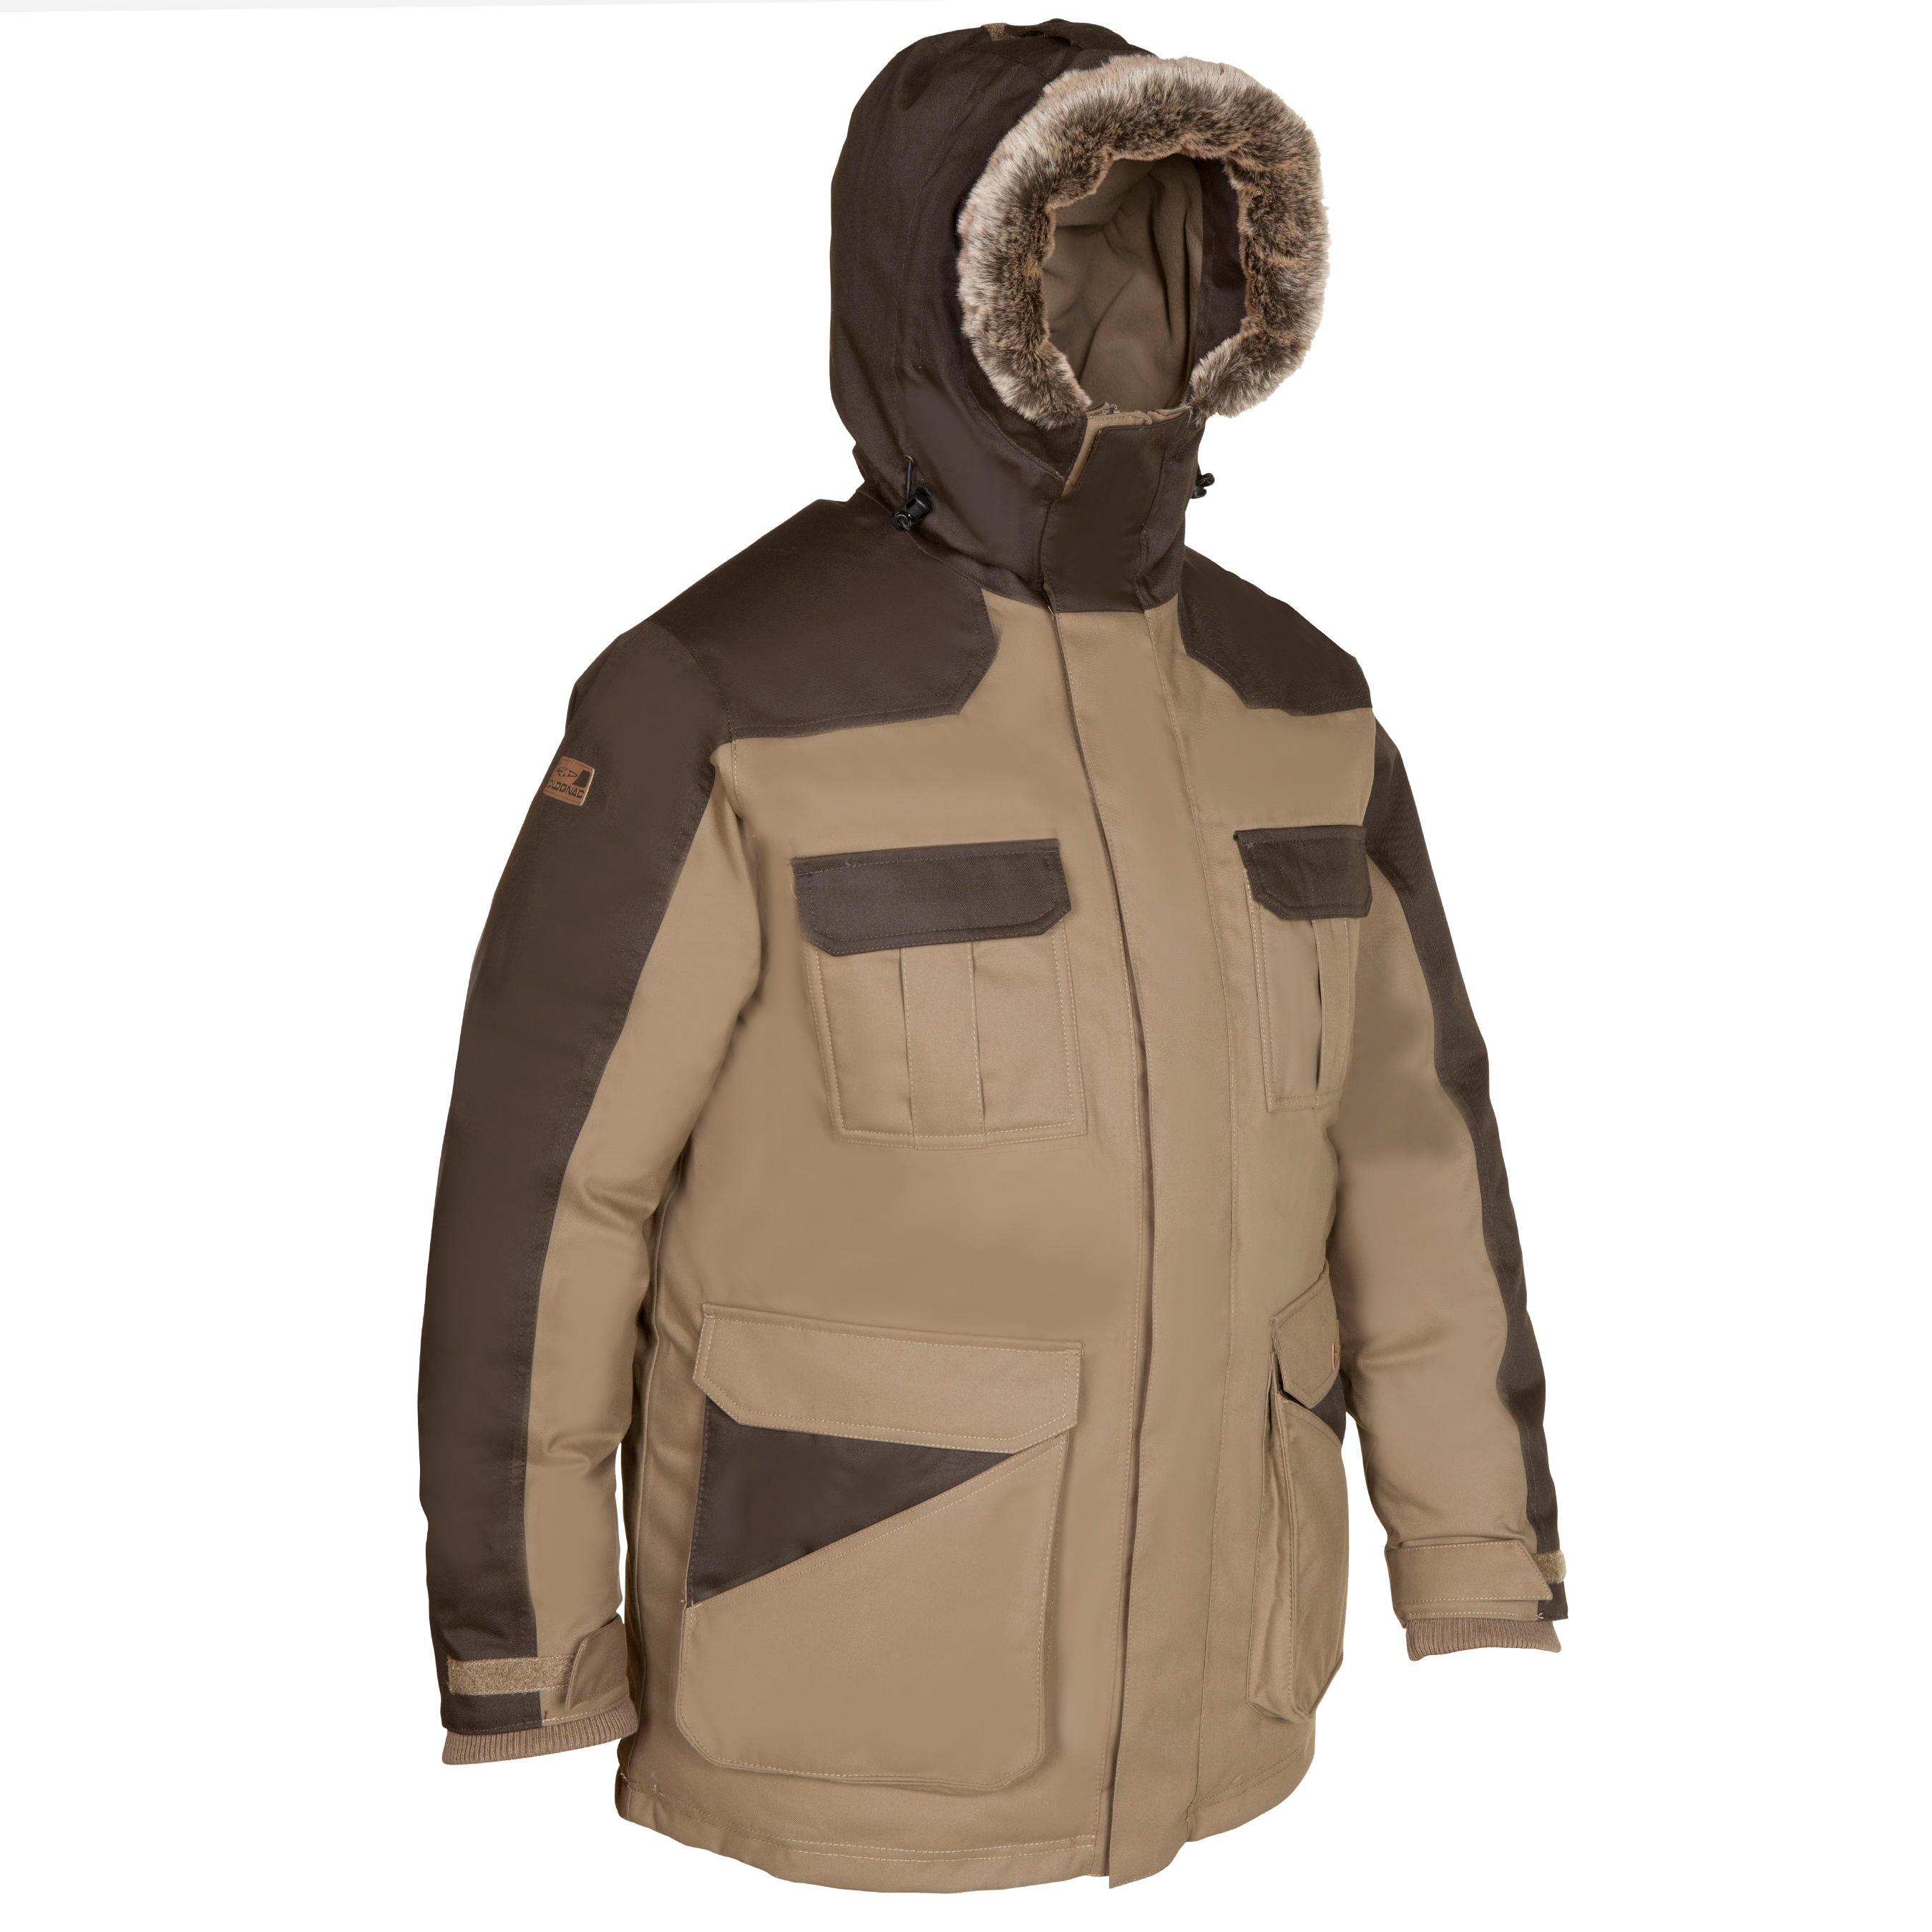 Solognac Jagersparka Toundra 300 voor extreme kou